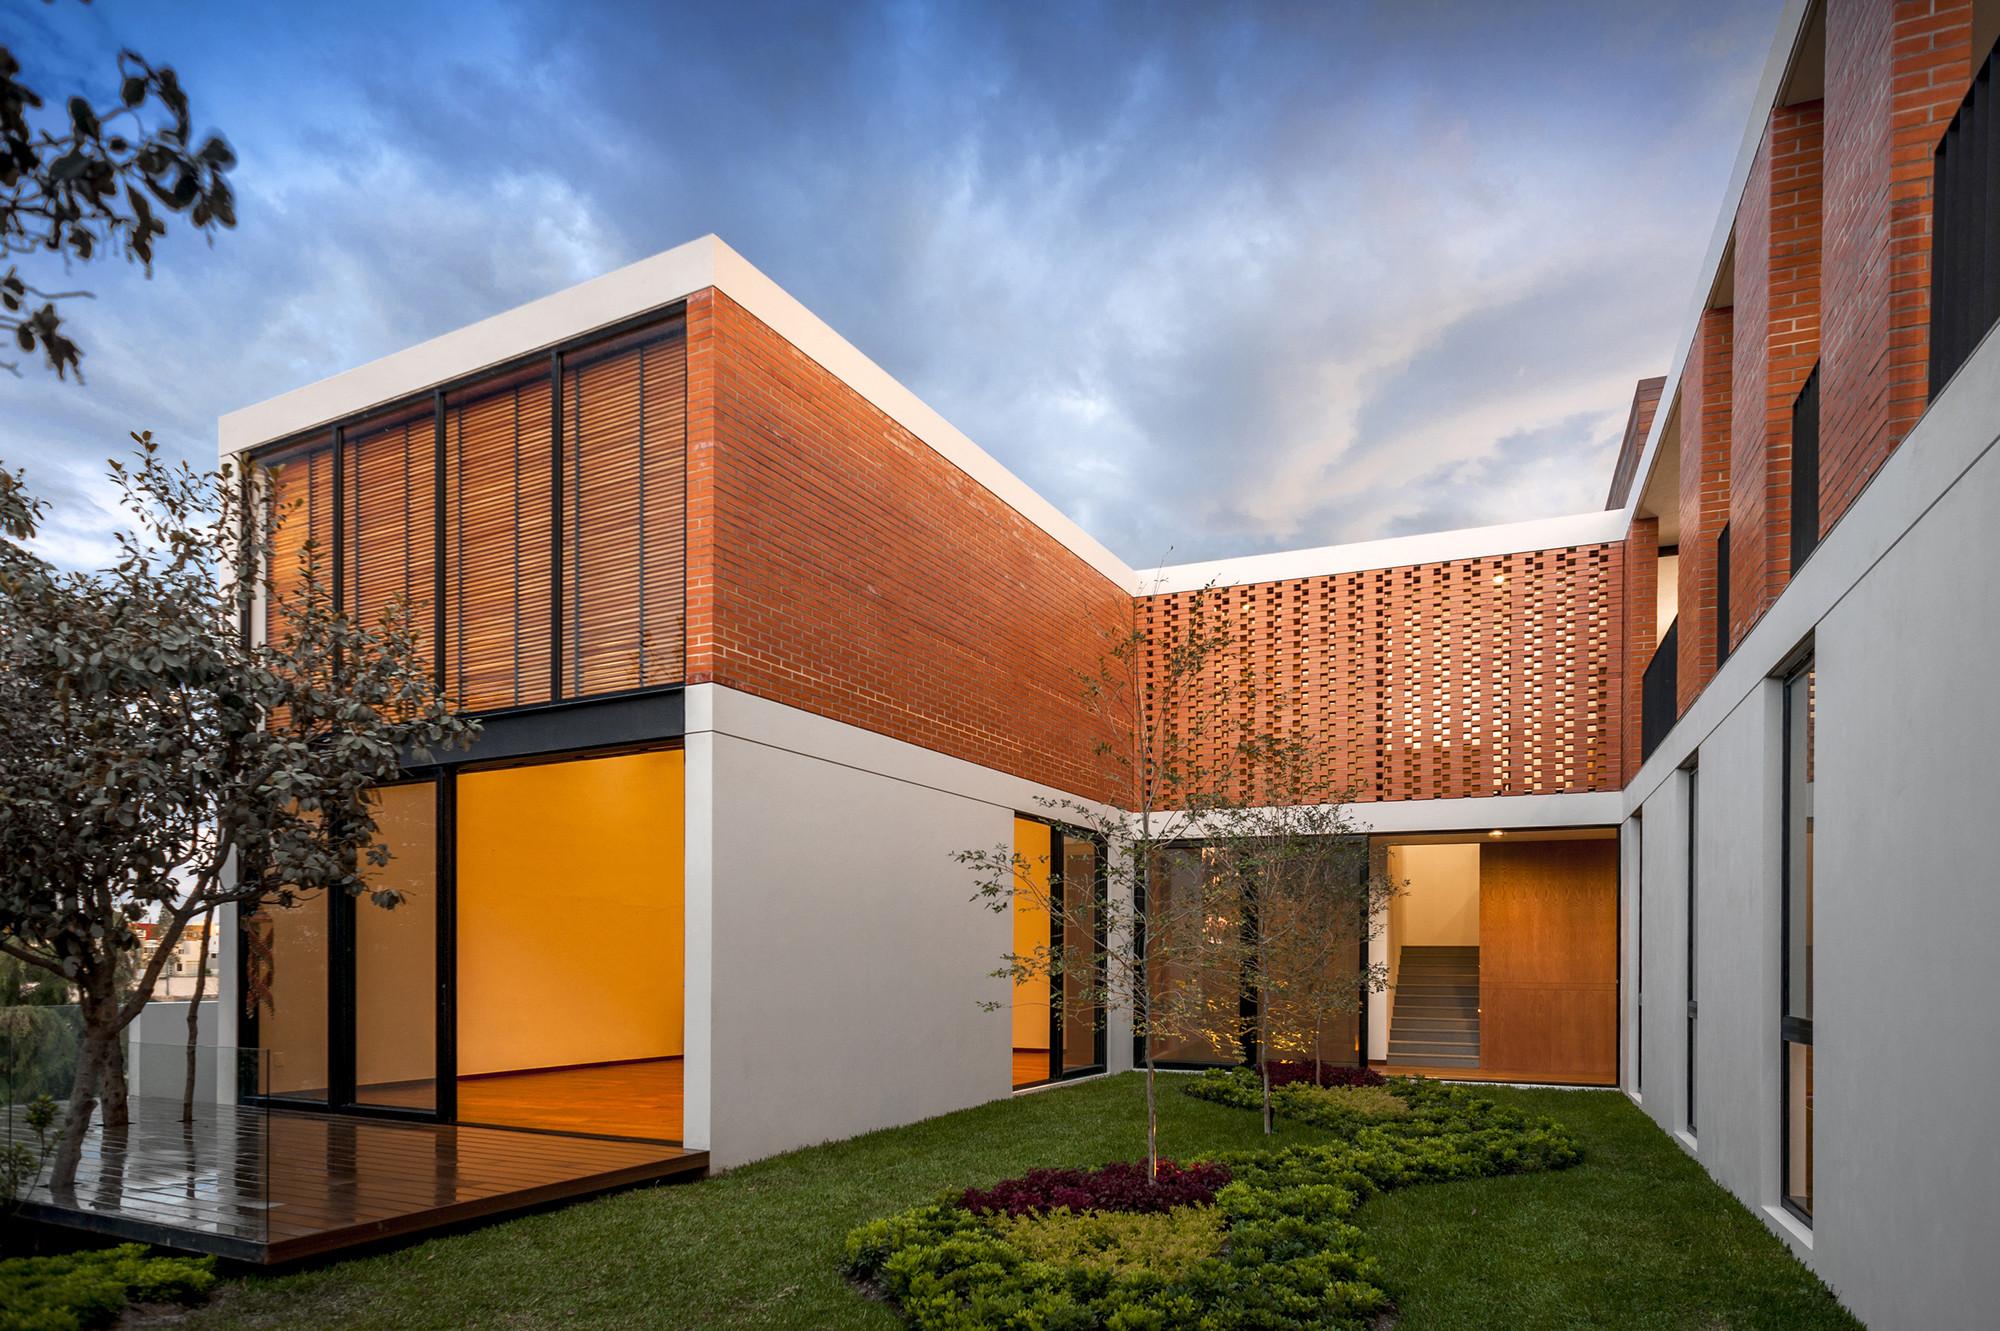 Galeria de casa ro alexanderson arquitectos 7 for Arquitectos para casas